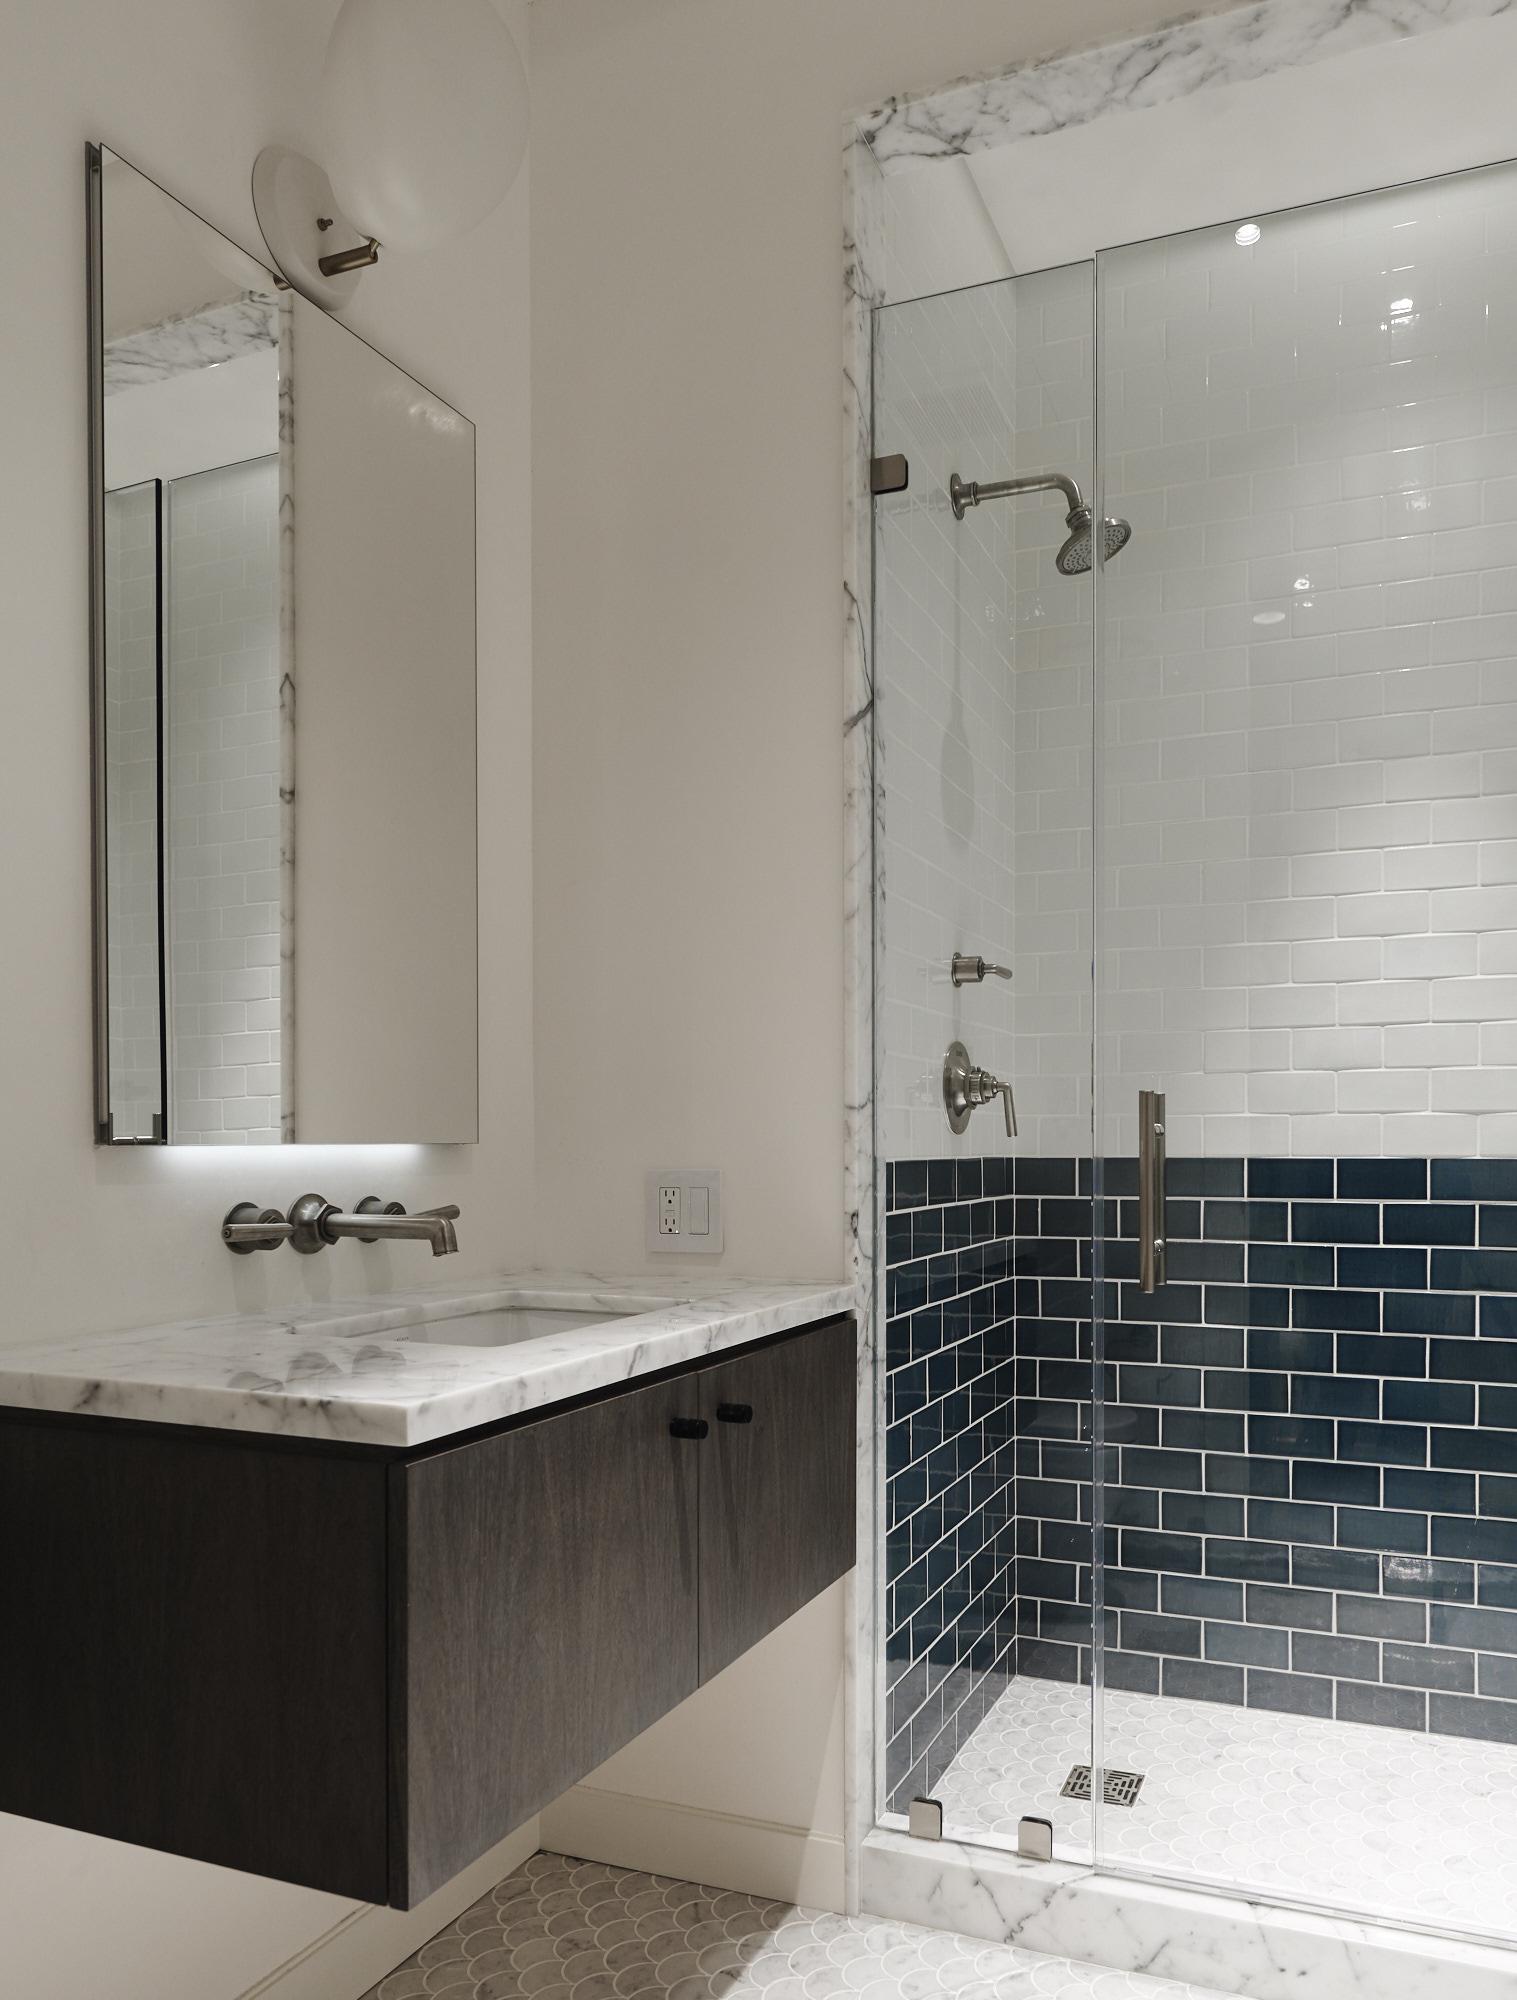 Modern Soho loft bathroom renovation minimal white and blue tile